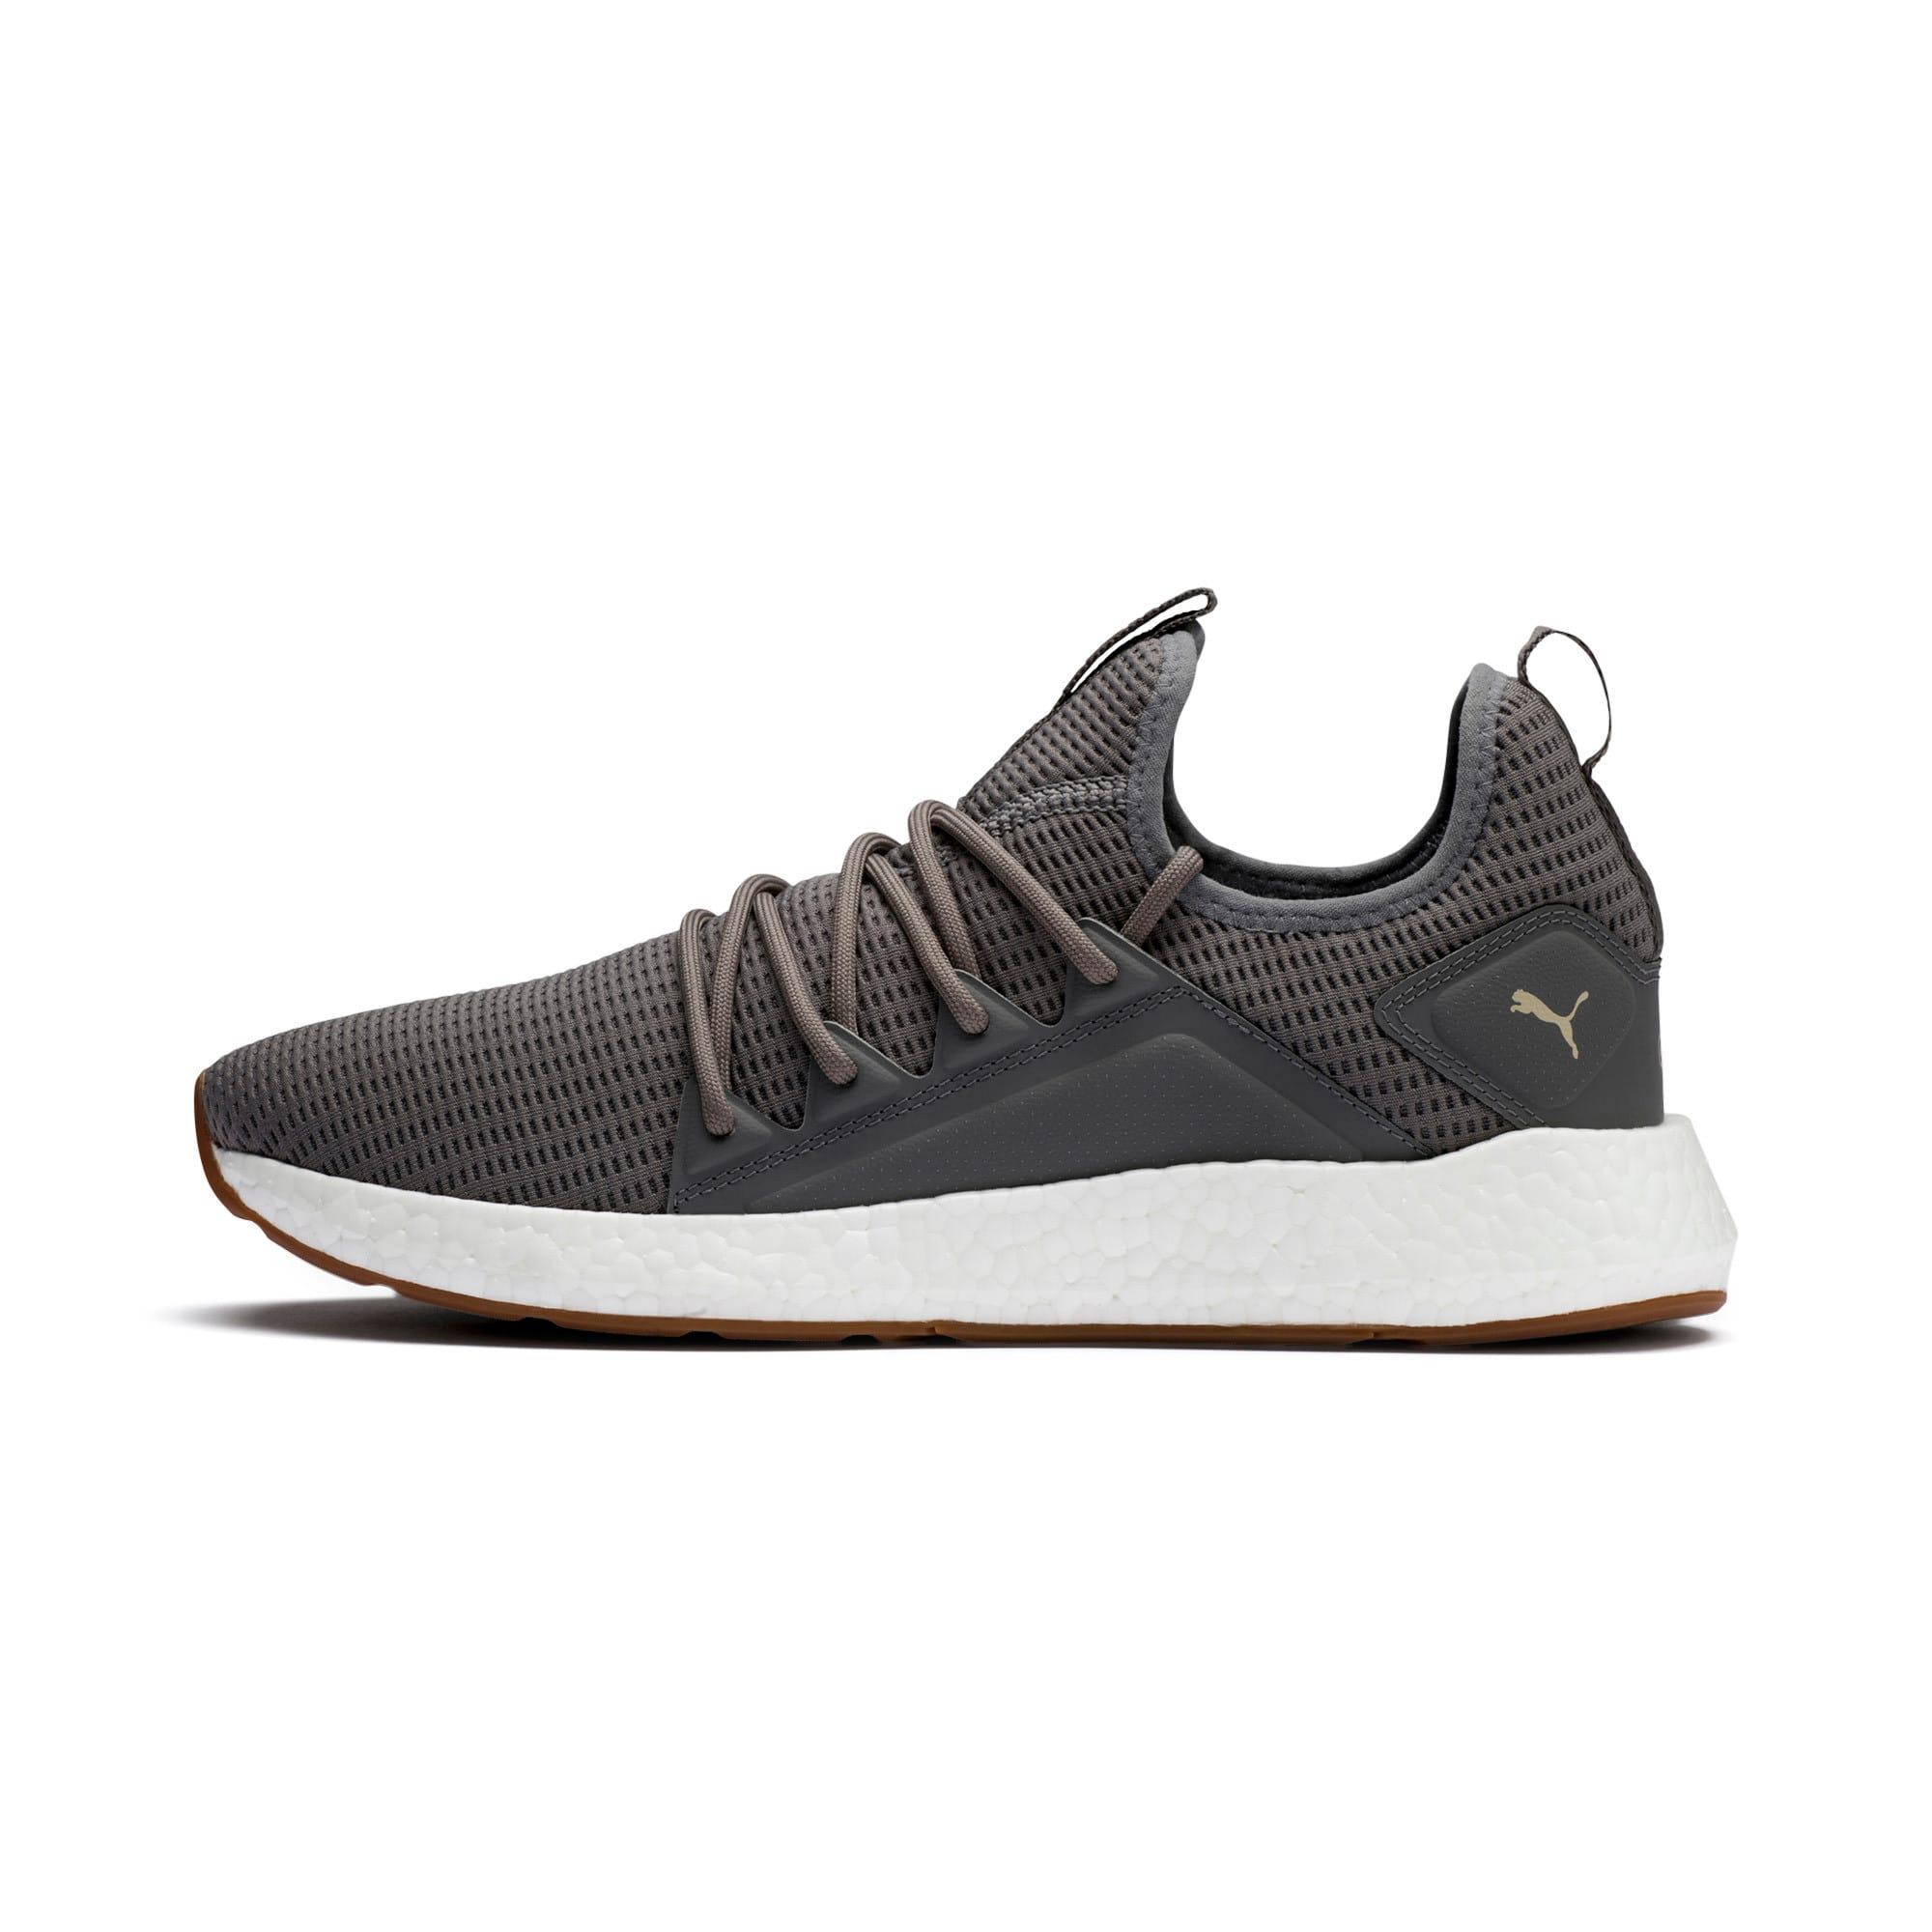 Thumbnail 1 of NRGY Neko Future Men's Running Shoes, Charcoal Gray-Taos Taupe, medium